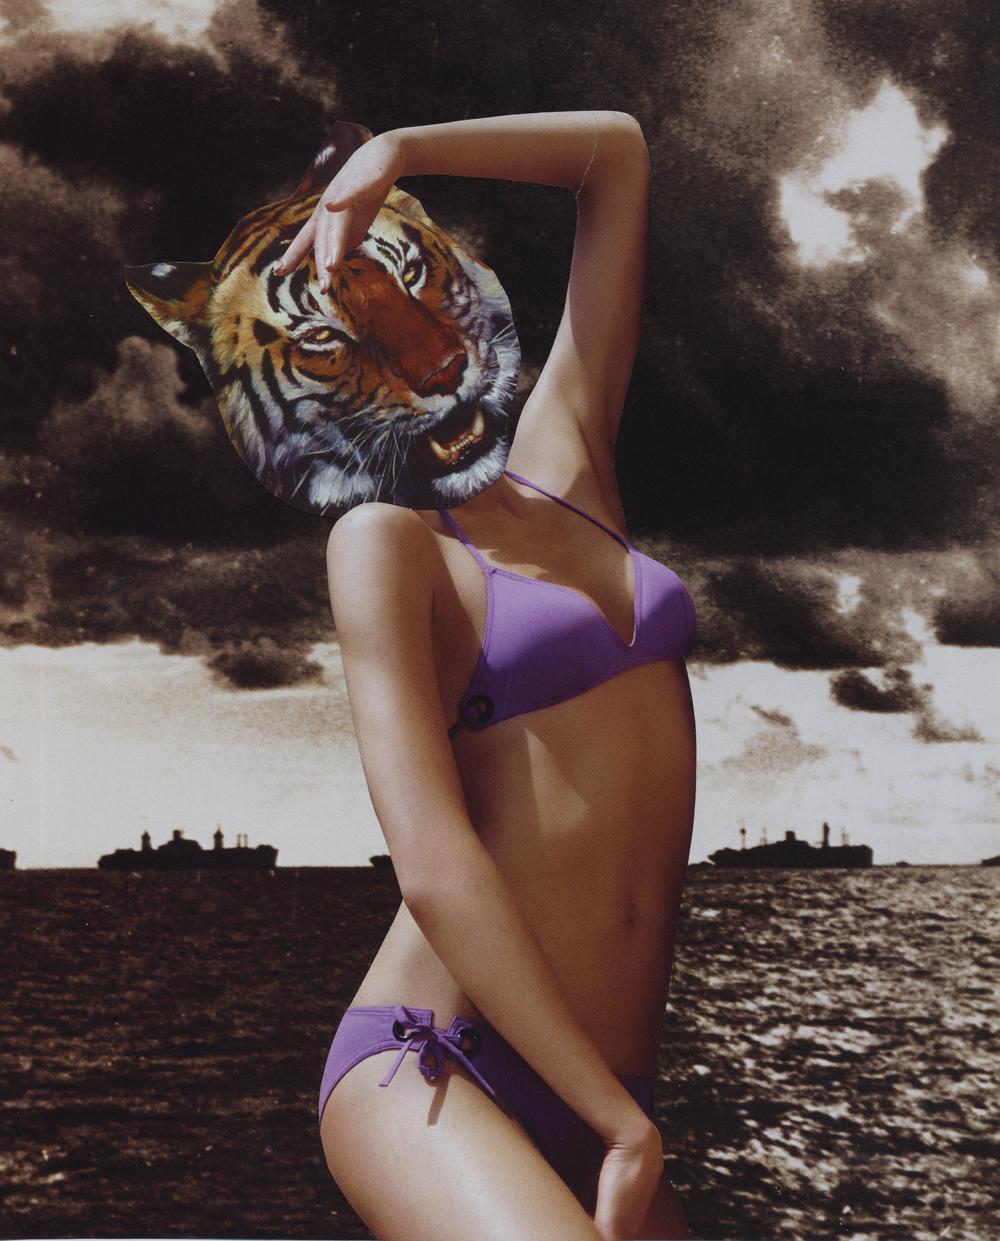 Tiger Bombshell, 2008 - Colleen Cunningham